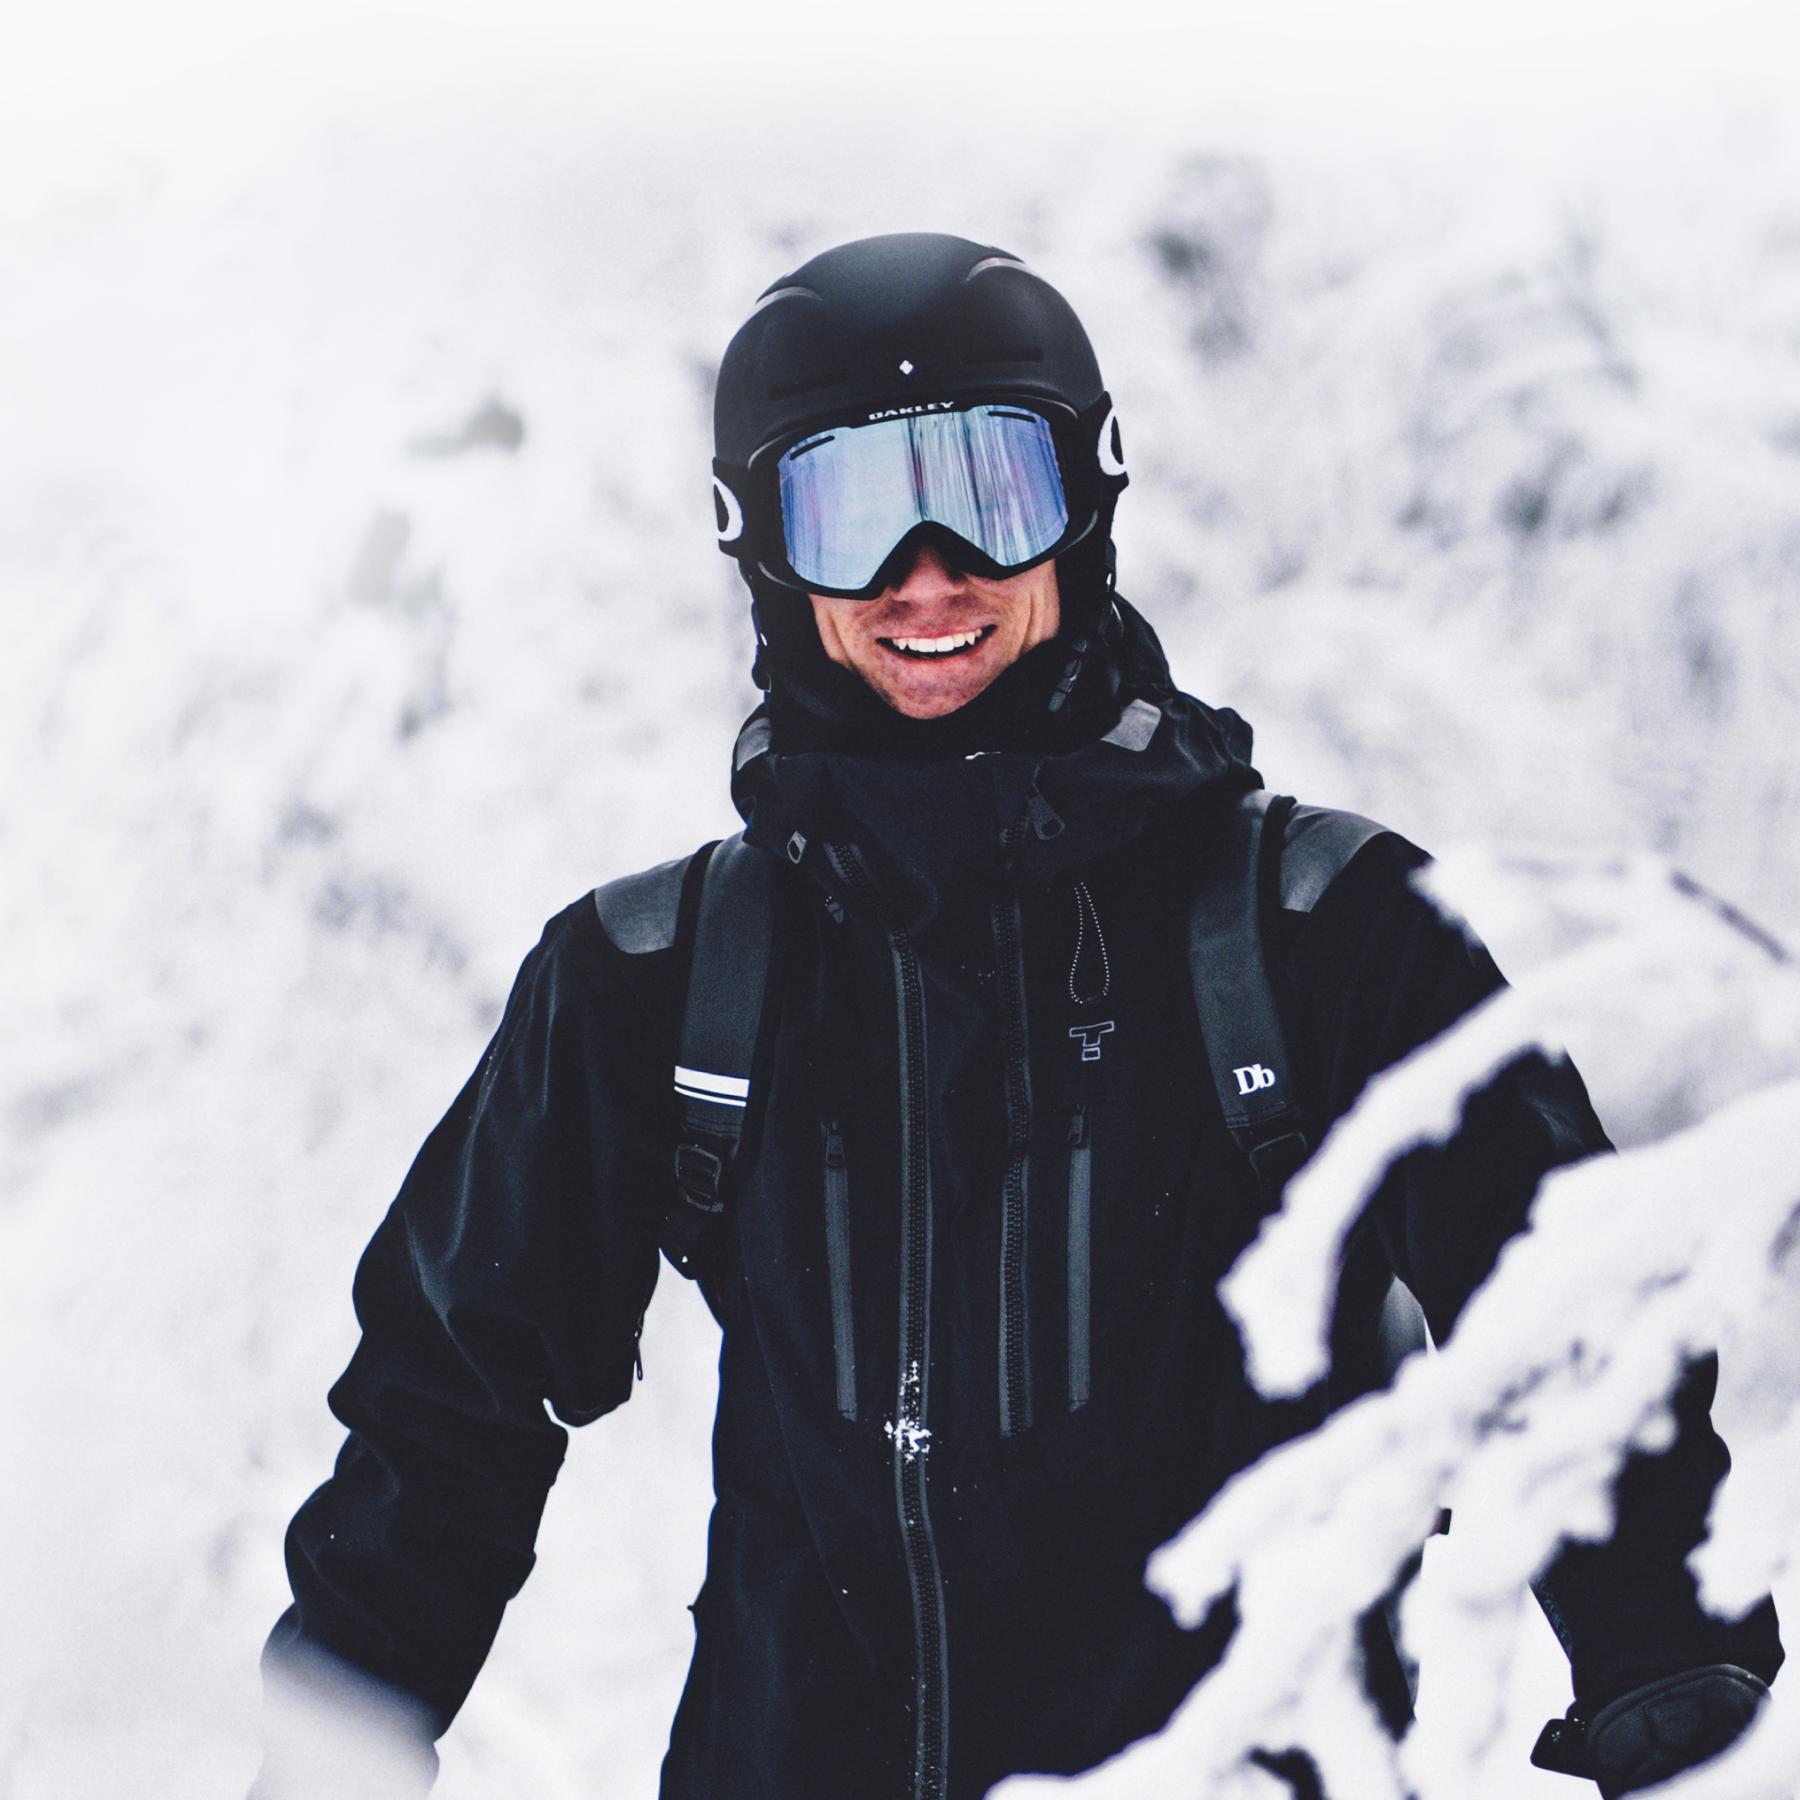 Skiing with twICEme